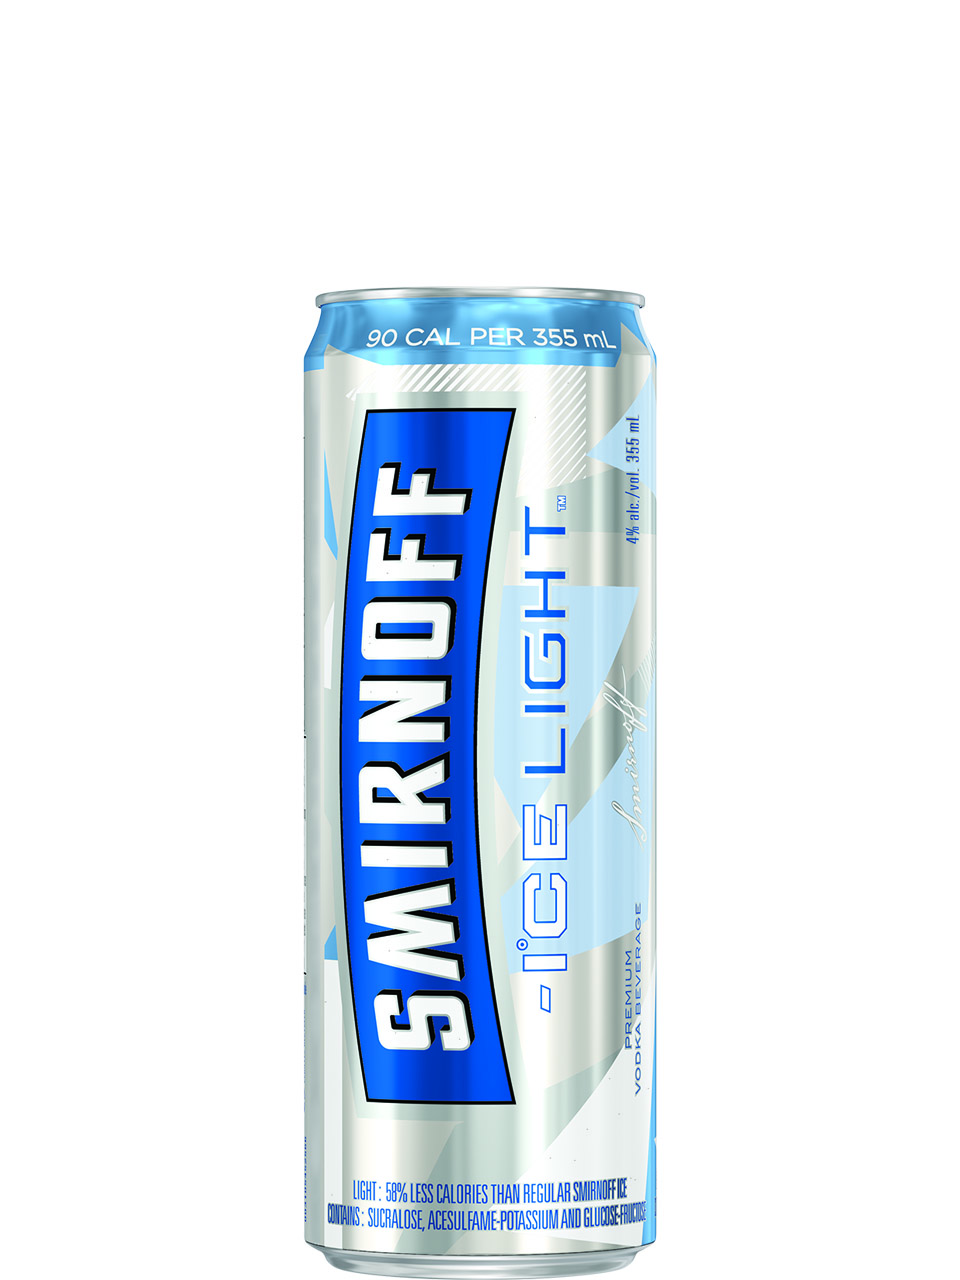 Smirnoff Ice Light 4 Pack Cans